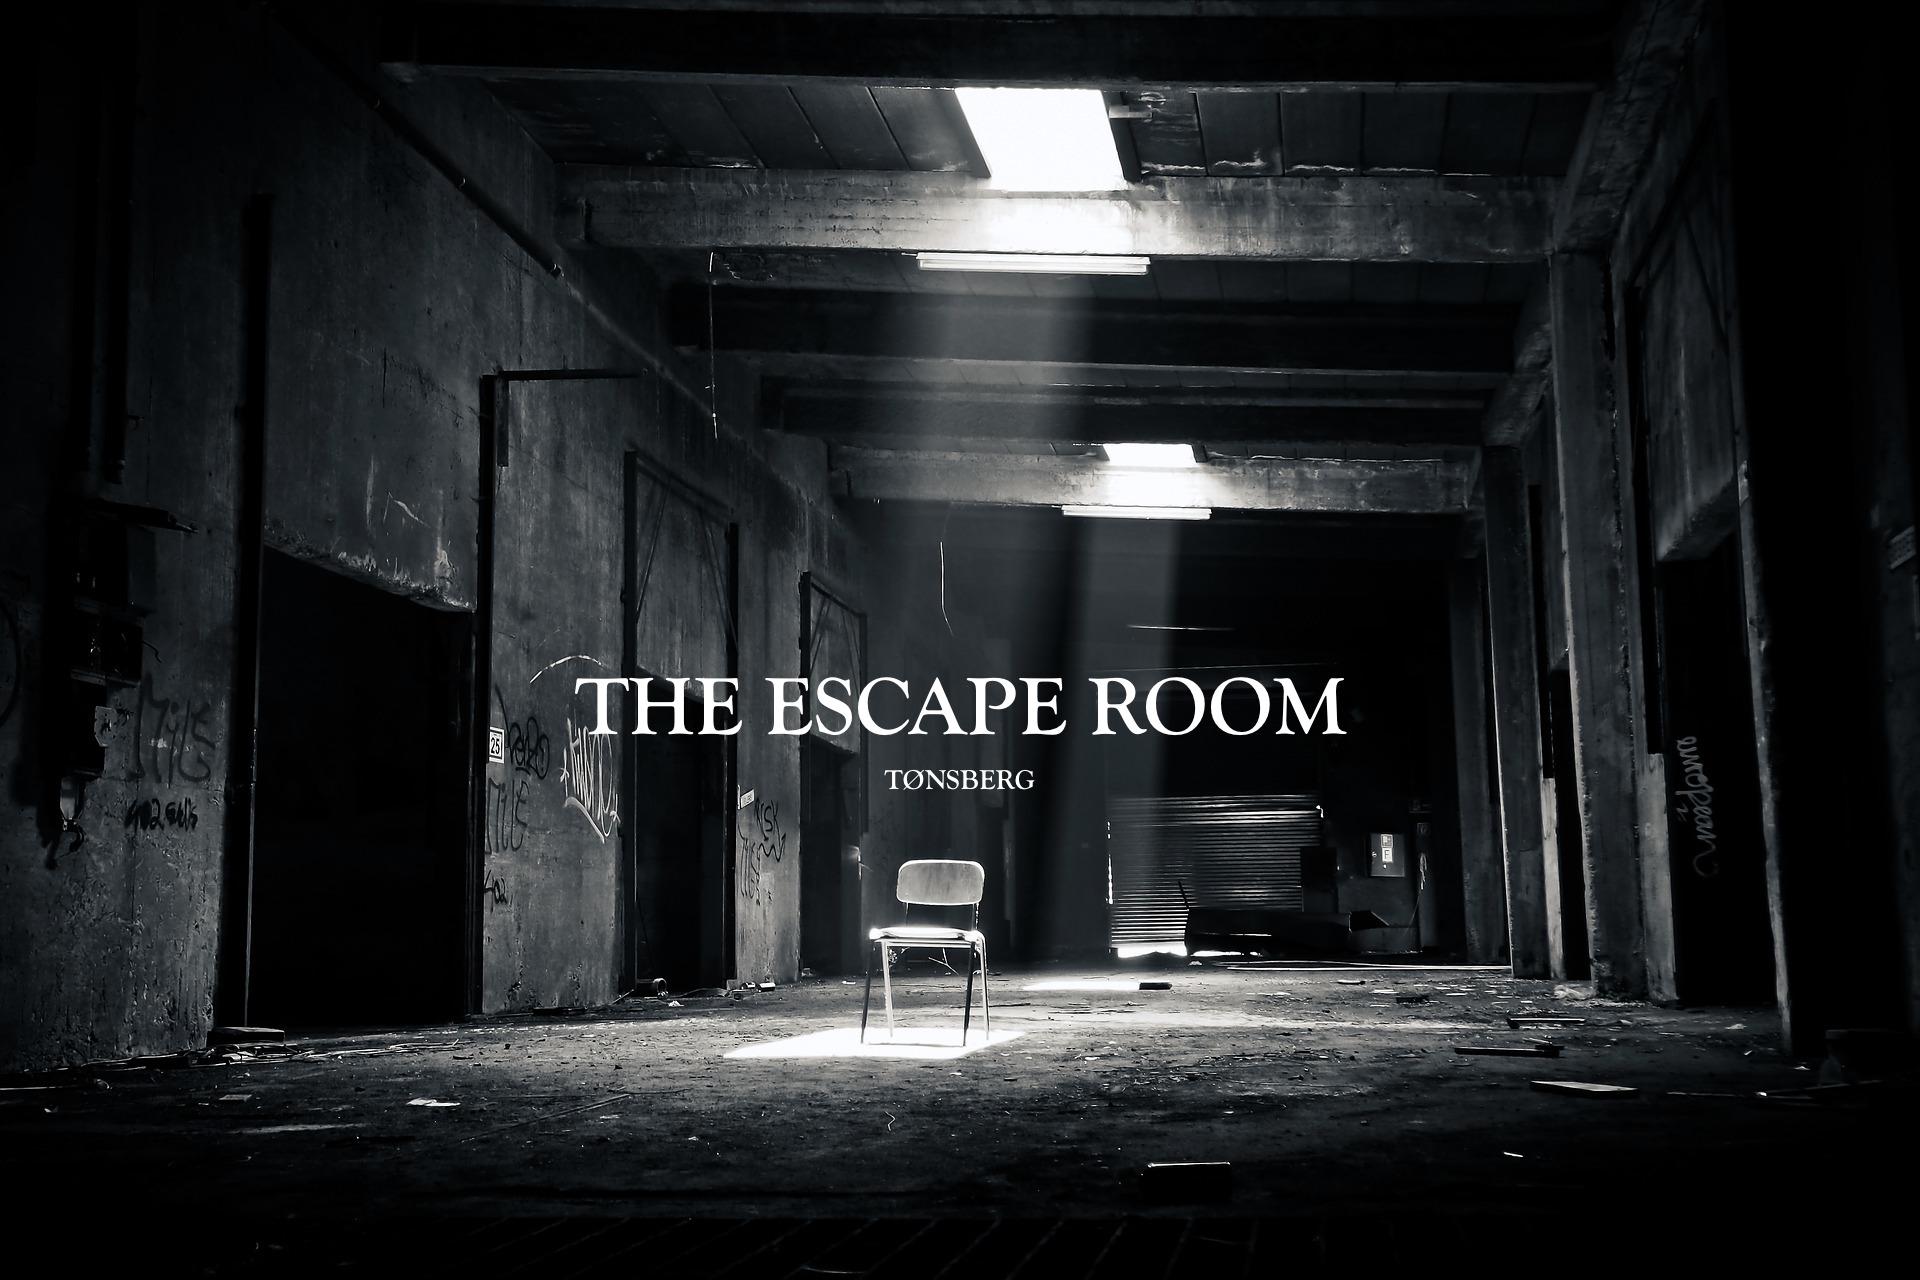 The escape room t nsberg i escaperom og escaperooms norge for Escape room design